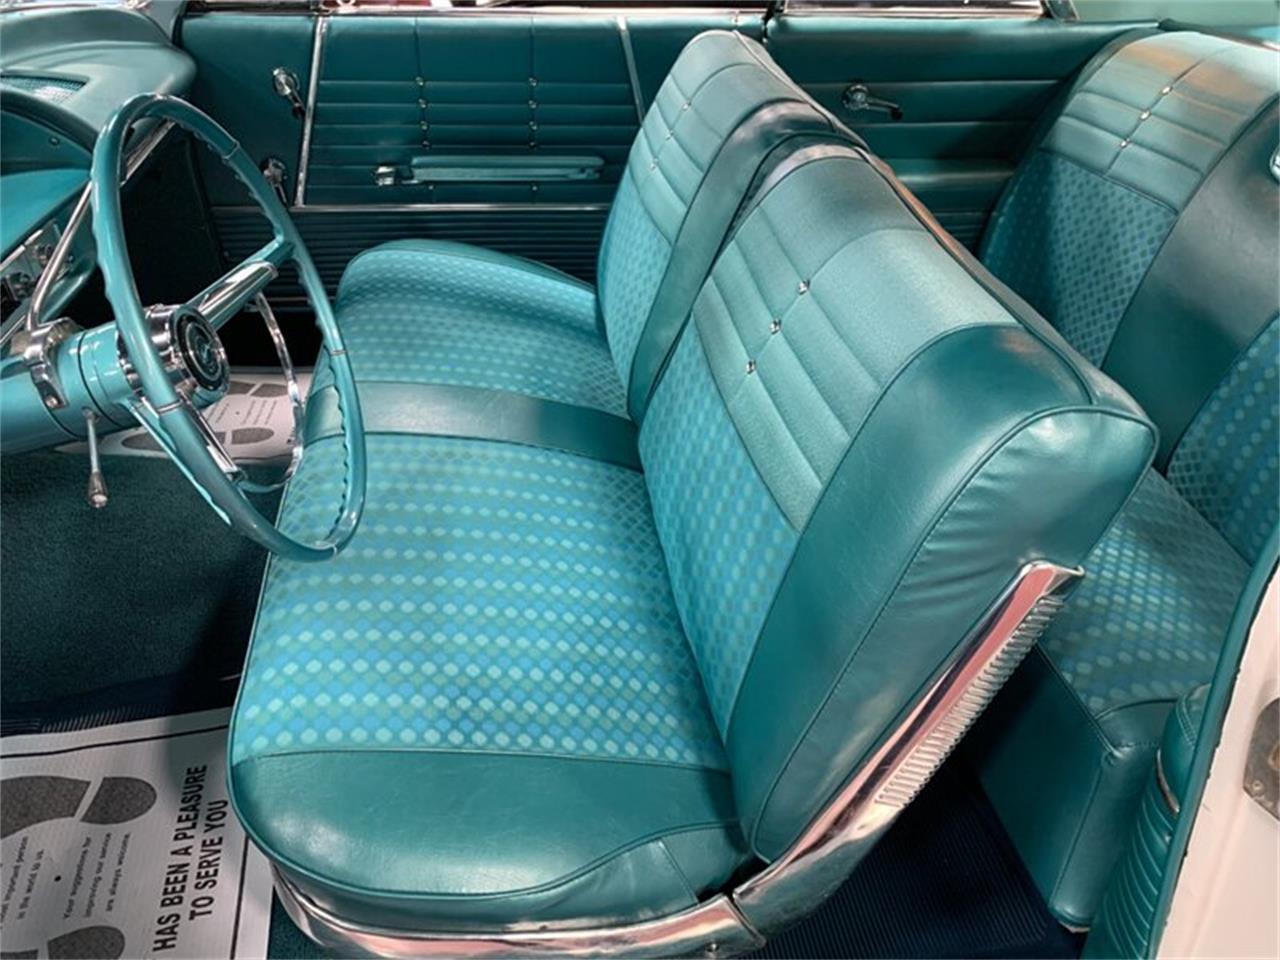 1964 Chevrolet Impala (CC-1231889) for sale in Bismarck, North Dakota